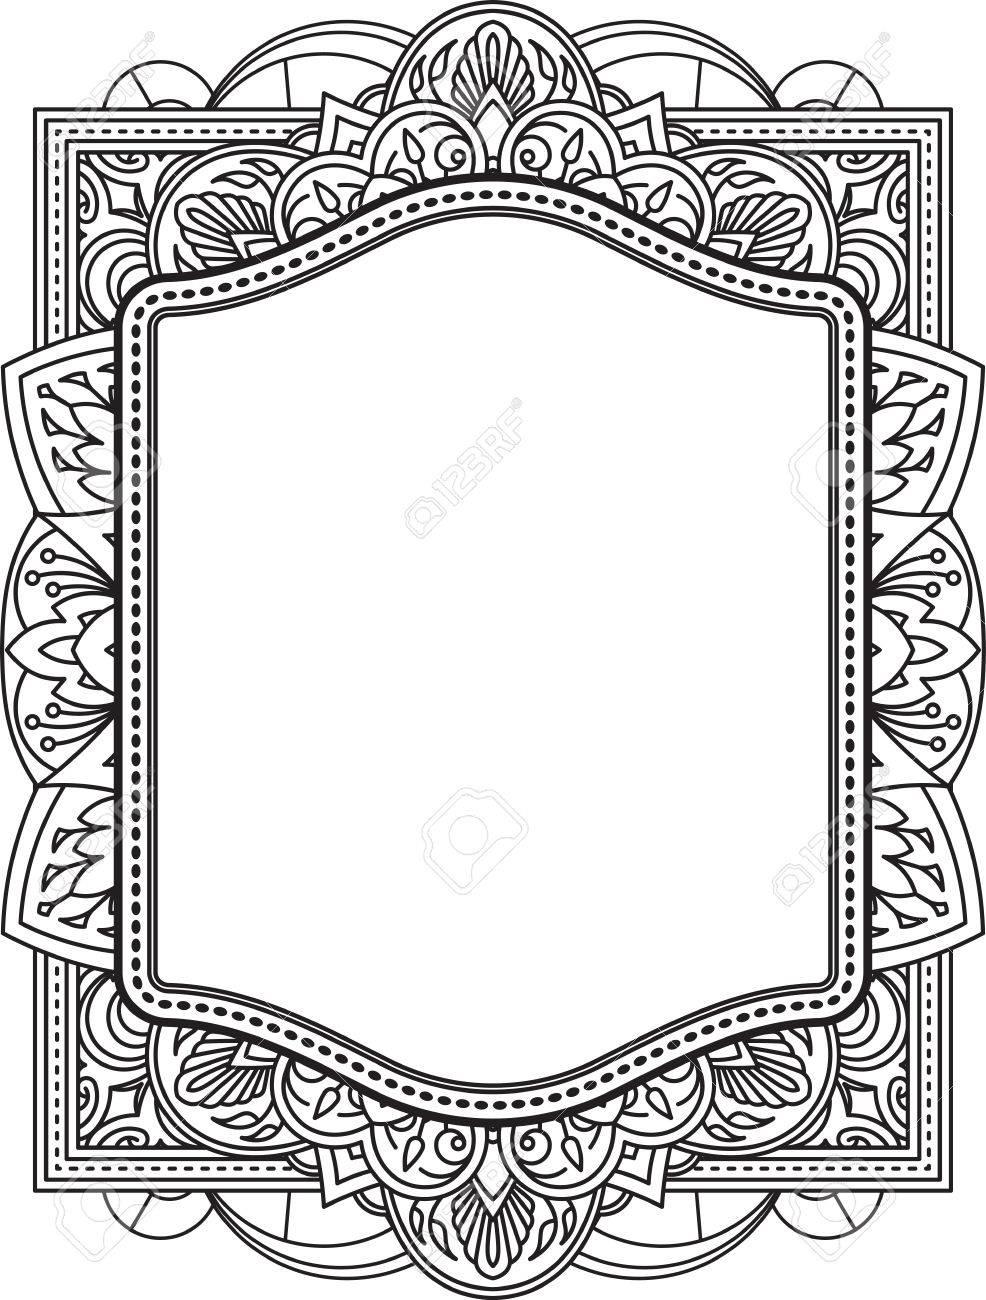 Ethnic template for design wedding invitations and greeting cards ethnic template for design wedding invitations and greeting cards henna flowers mehndi elements of vintage stopboris Images